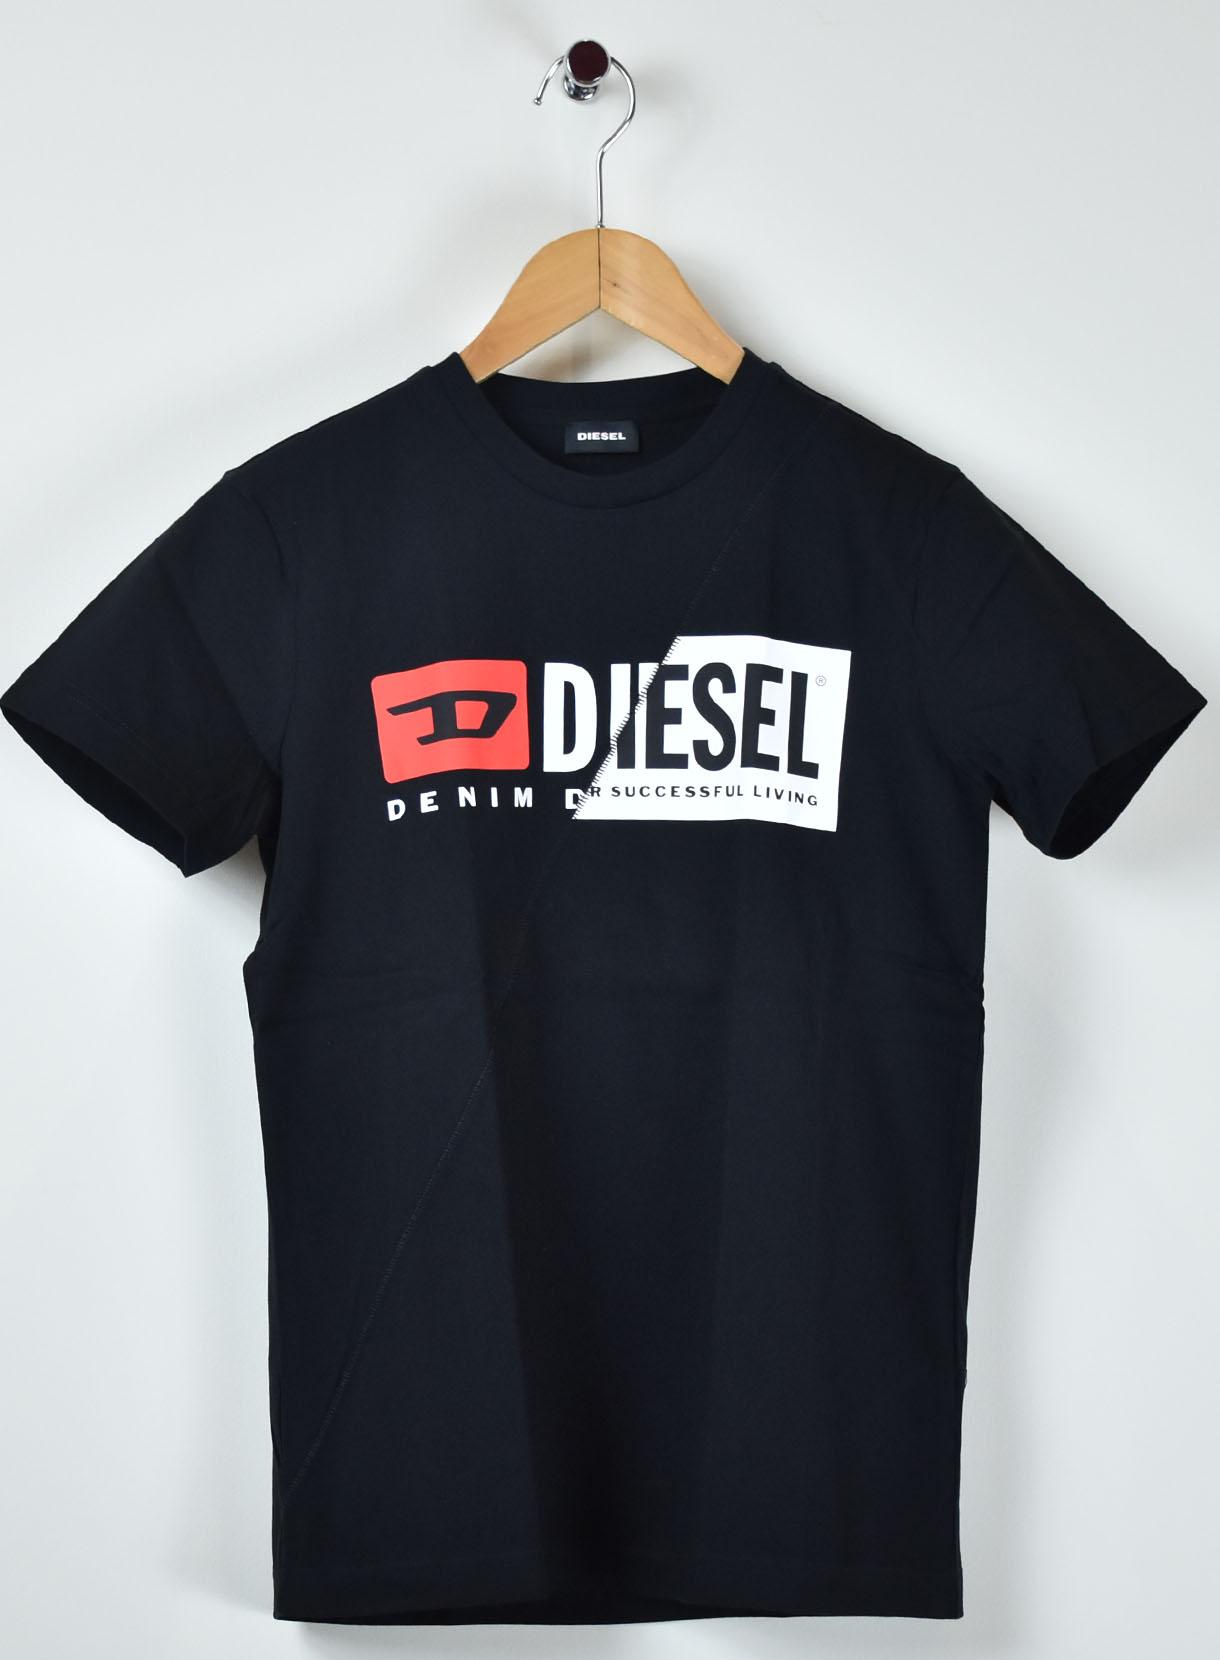 DIESEL NEW ロゴTシャツ